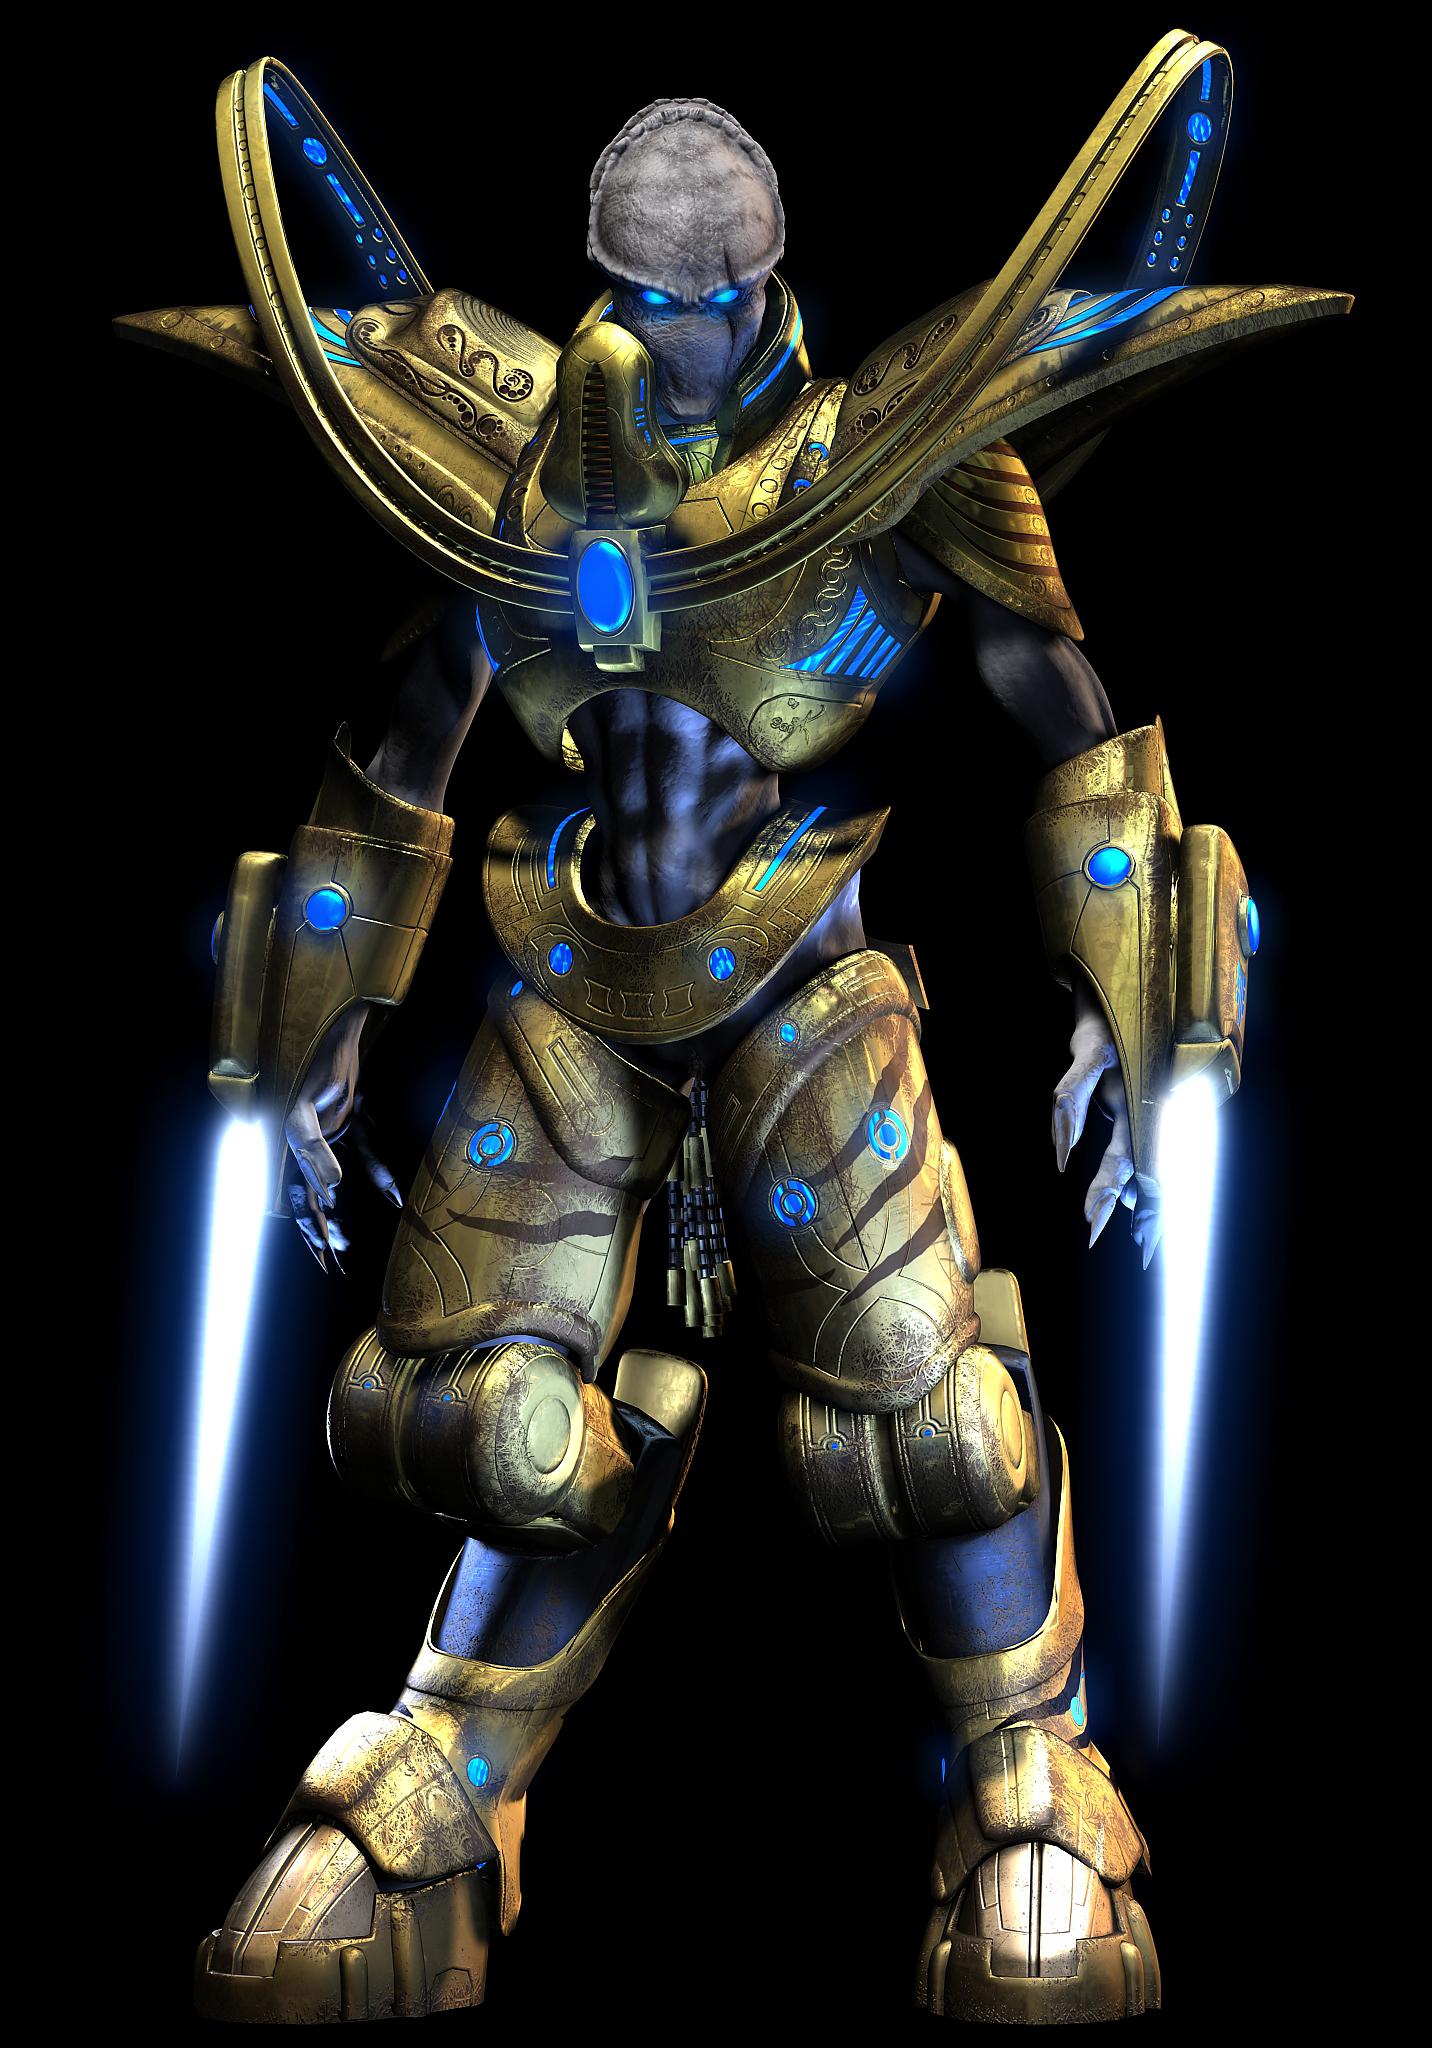 SpaceBattles are Protoss warriors in StarGate Universe